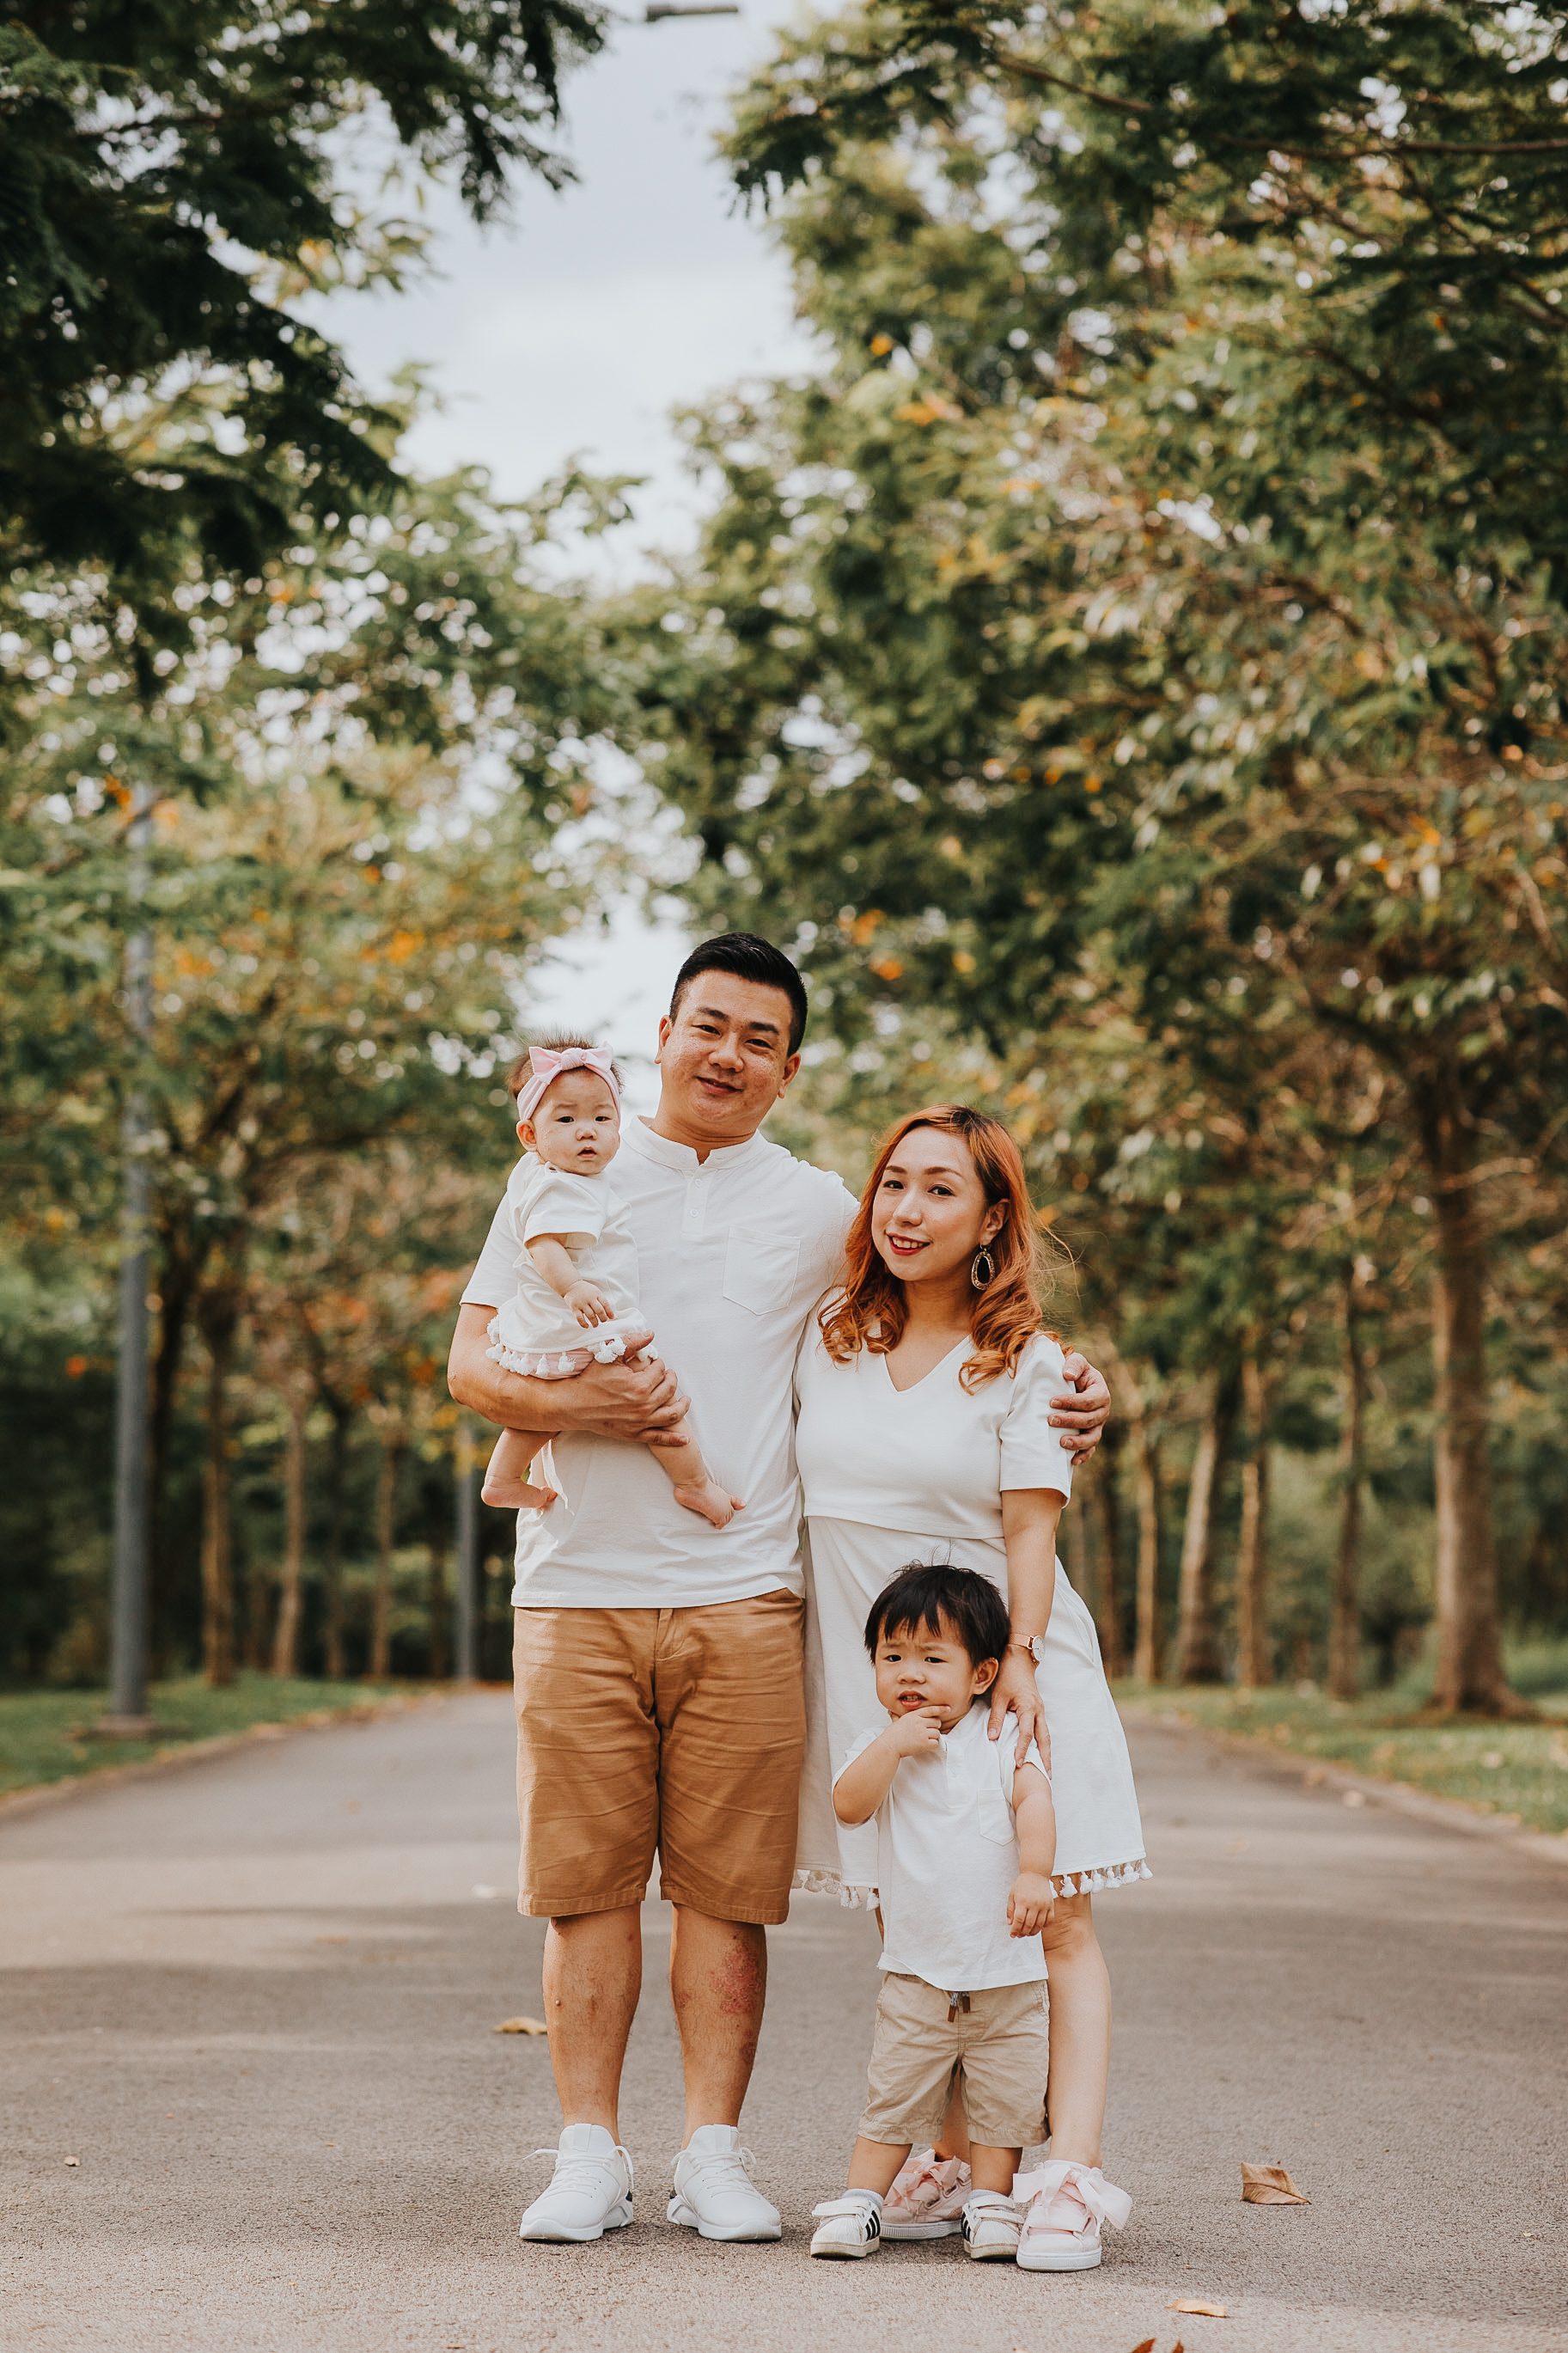 Nadskai Family 2019 (1).jpg